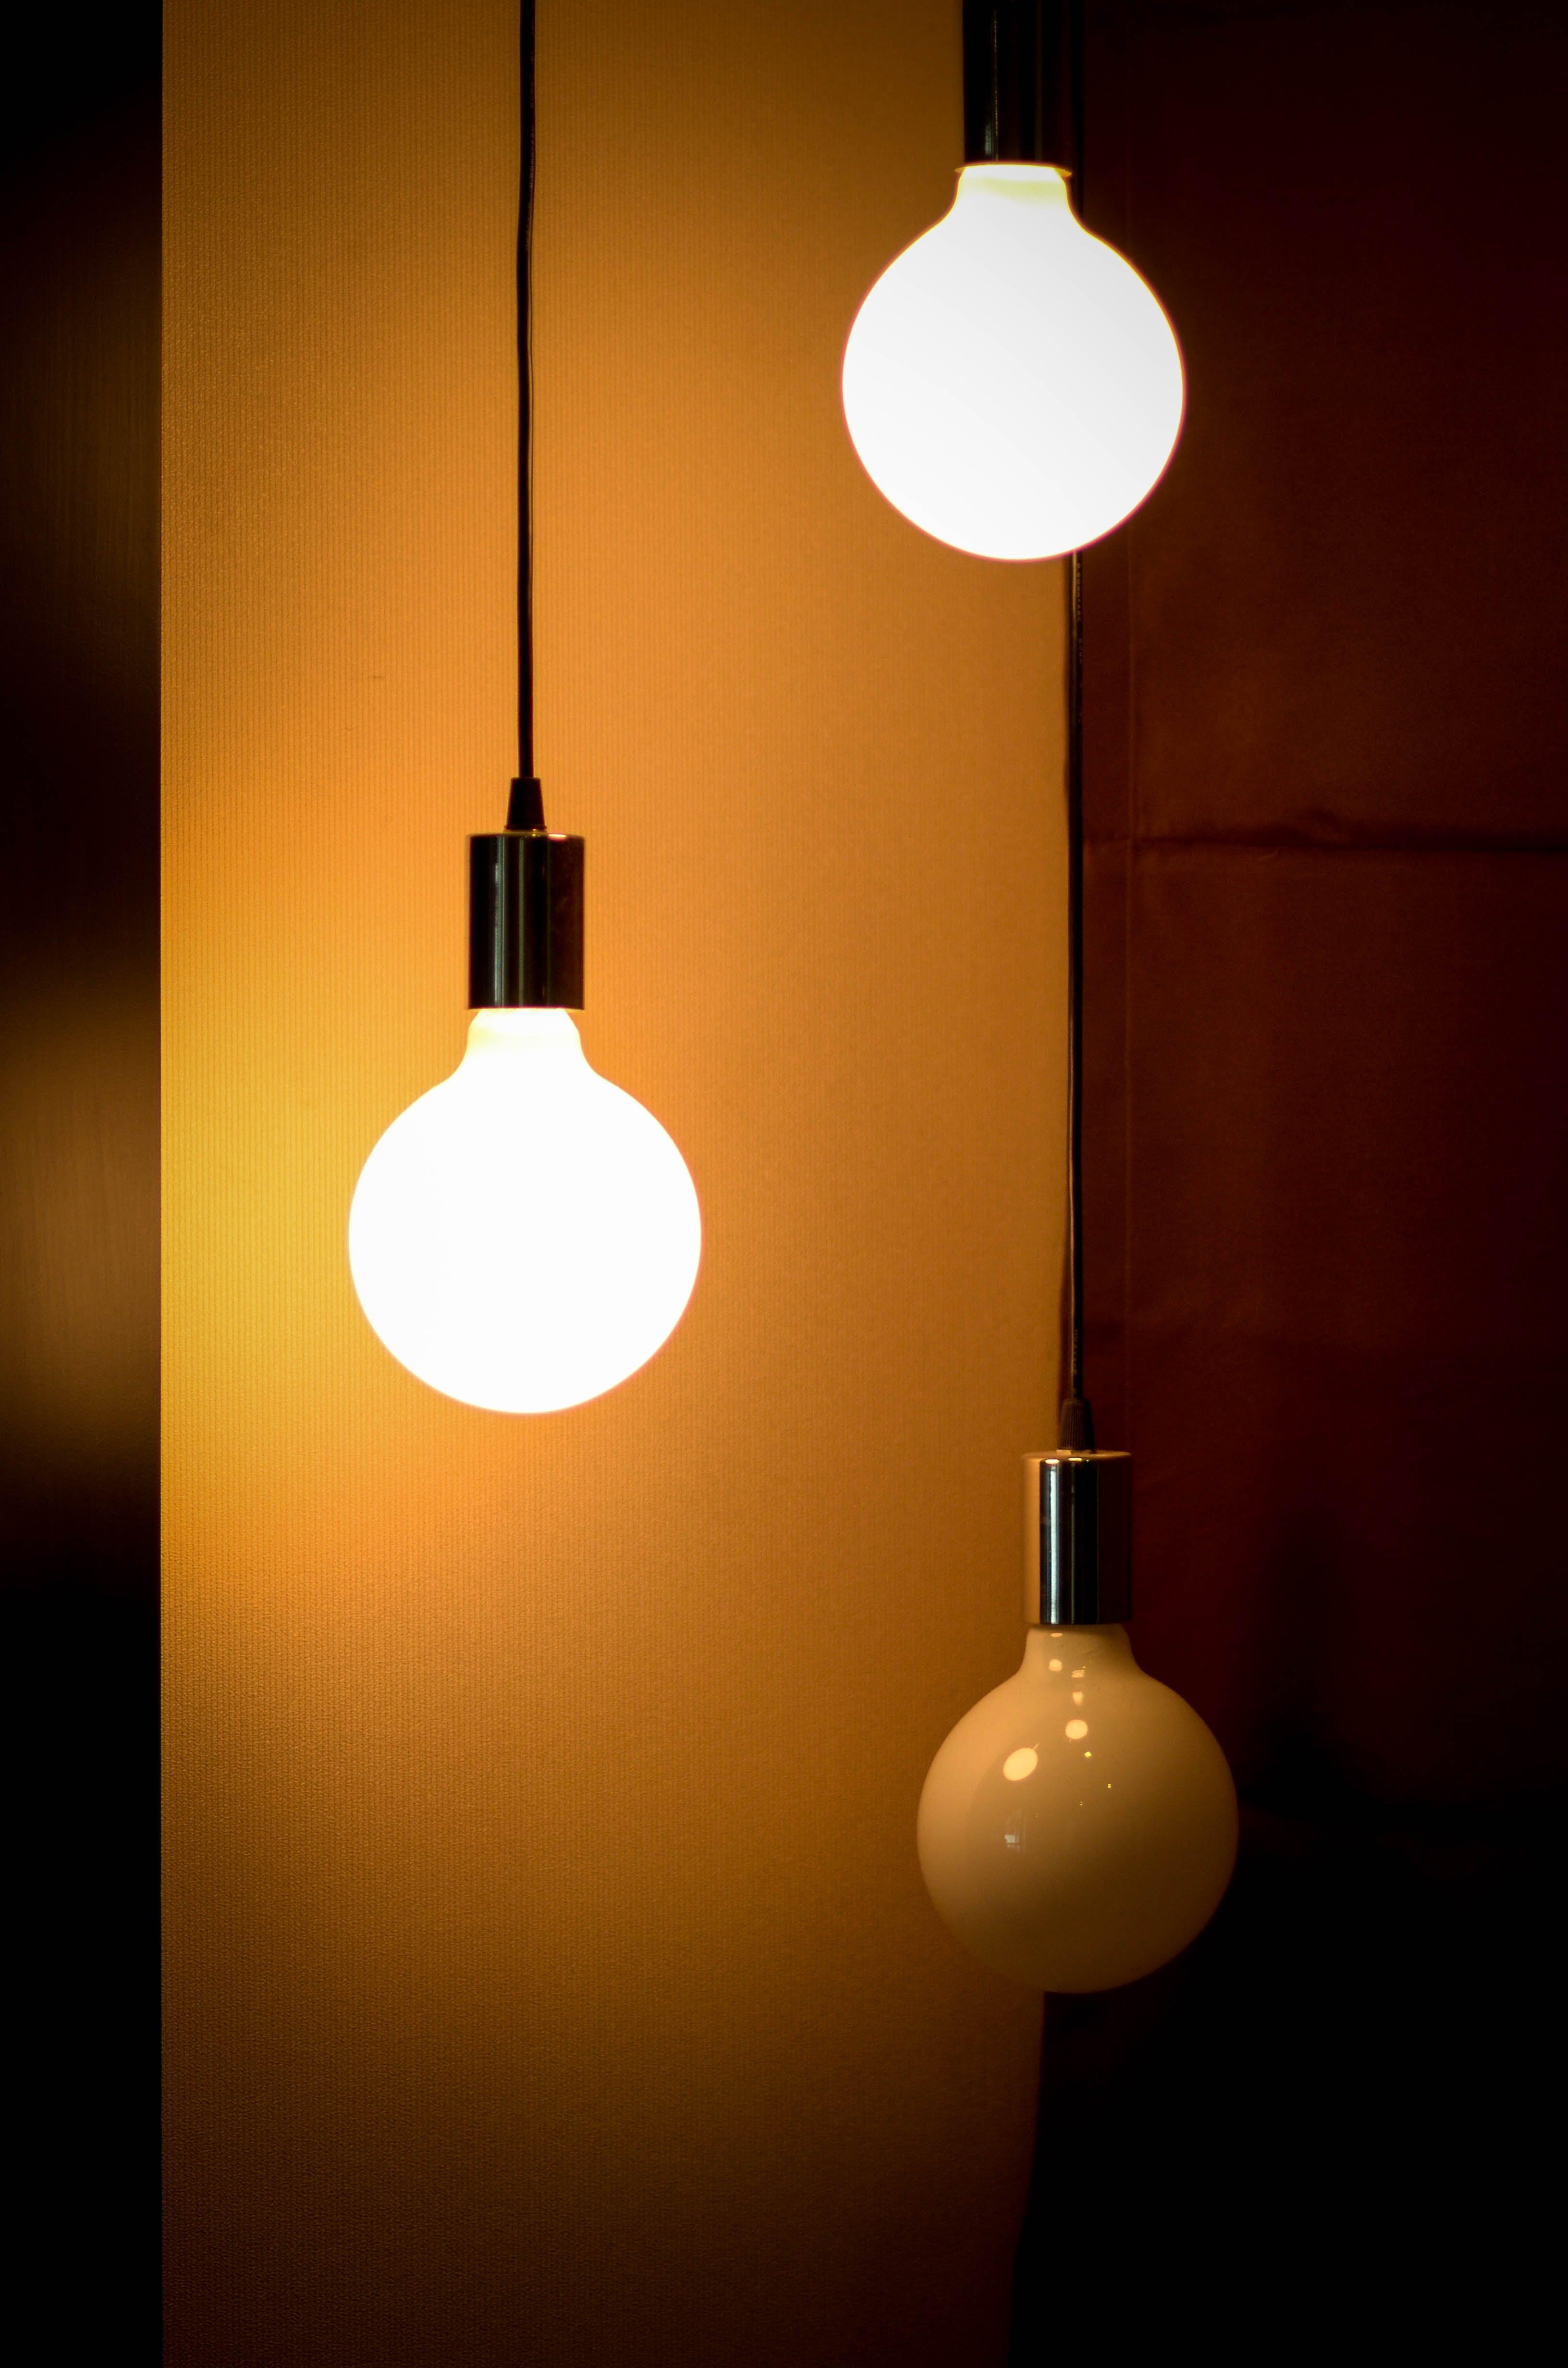 bright, bulb, close-up